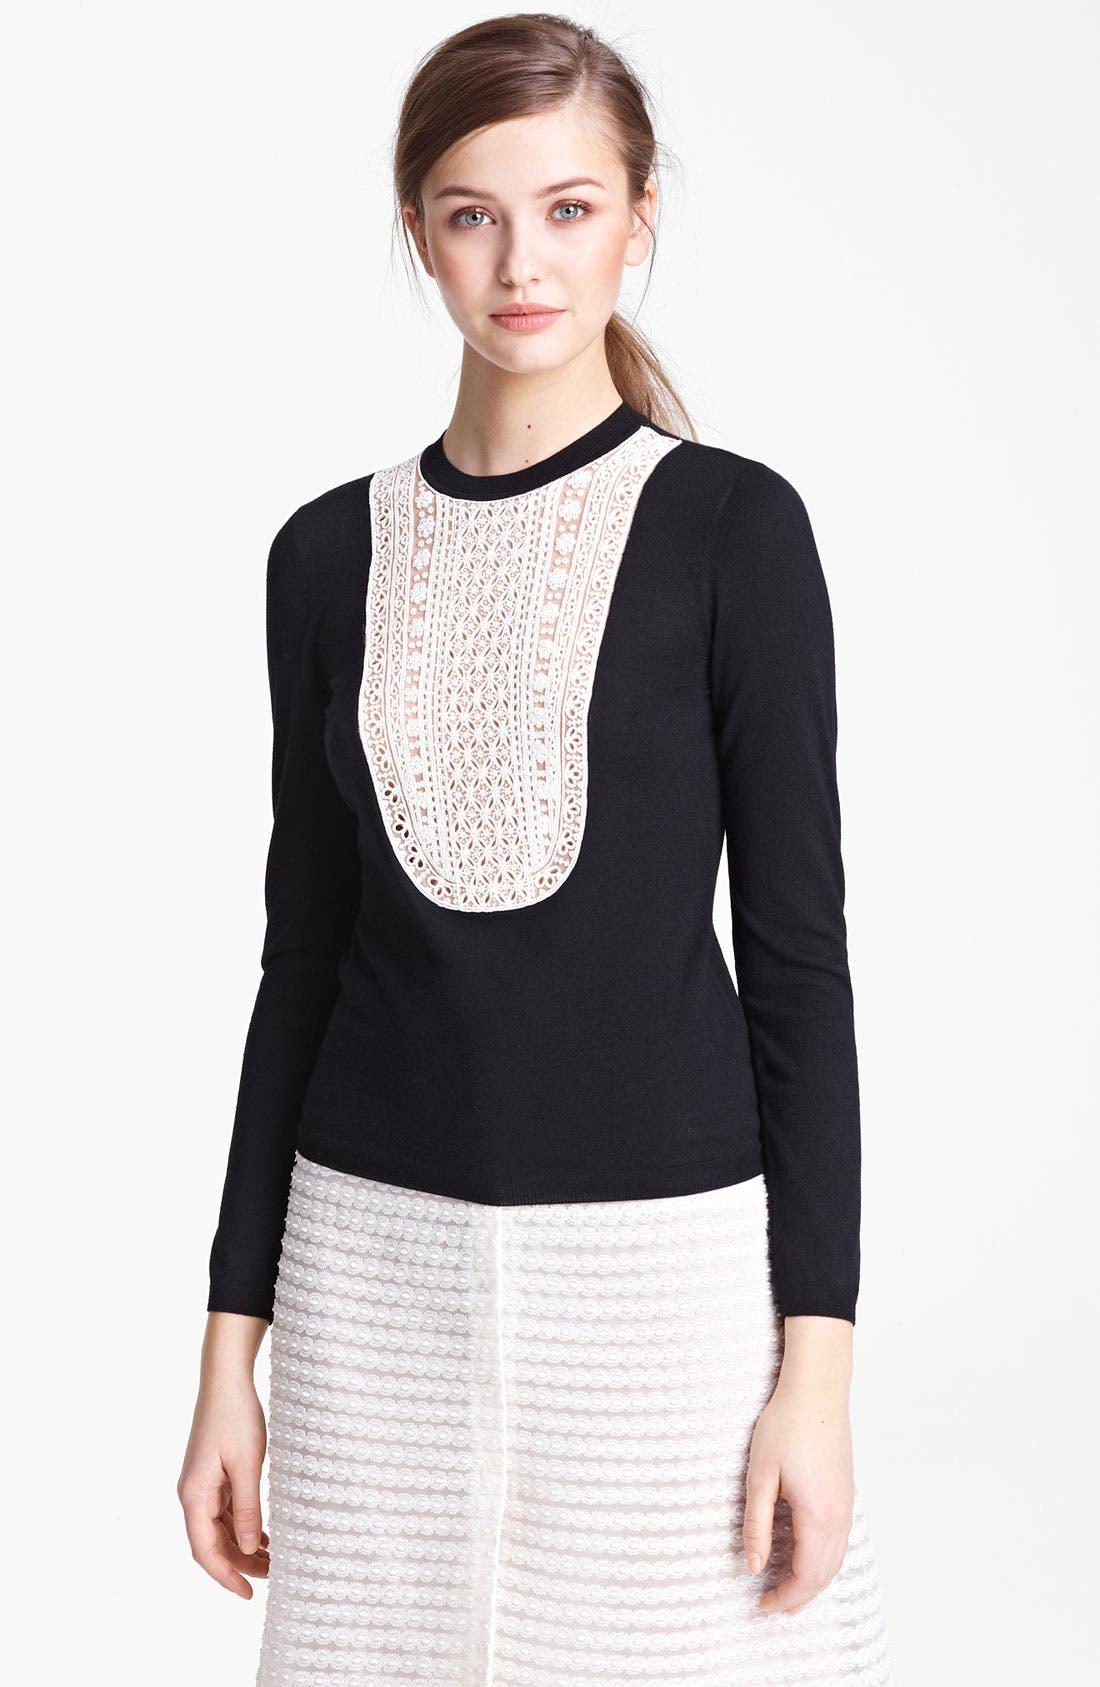 Main Image - Valentino Embroidered Bib Knit Top